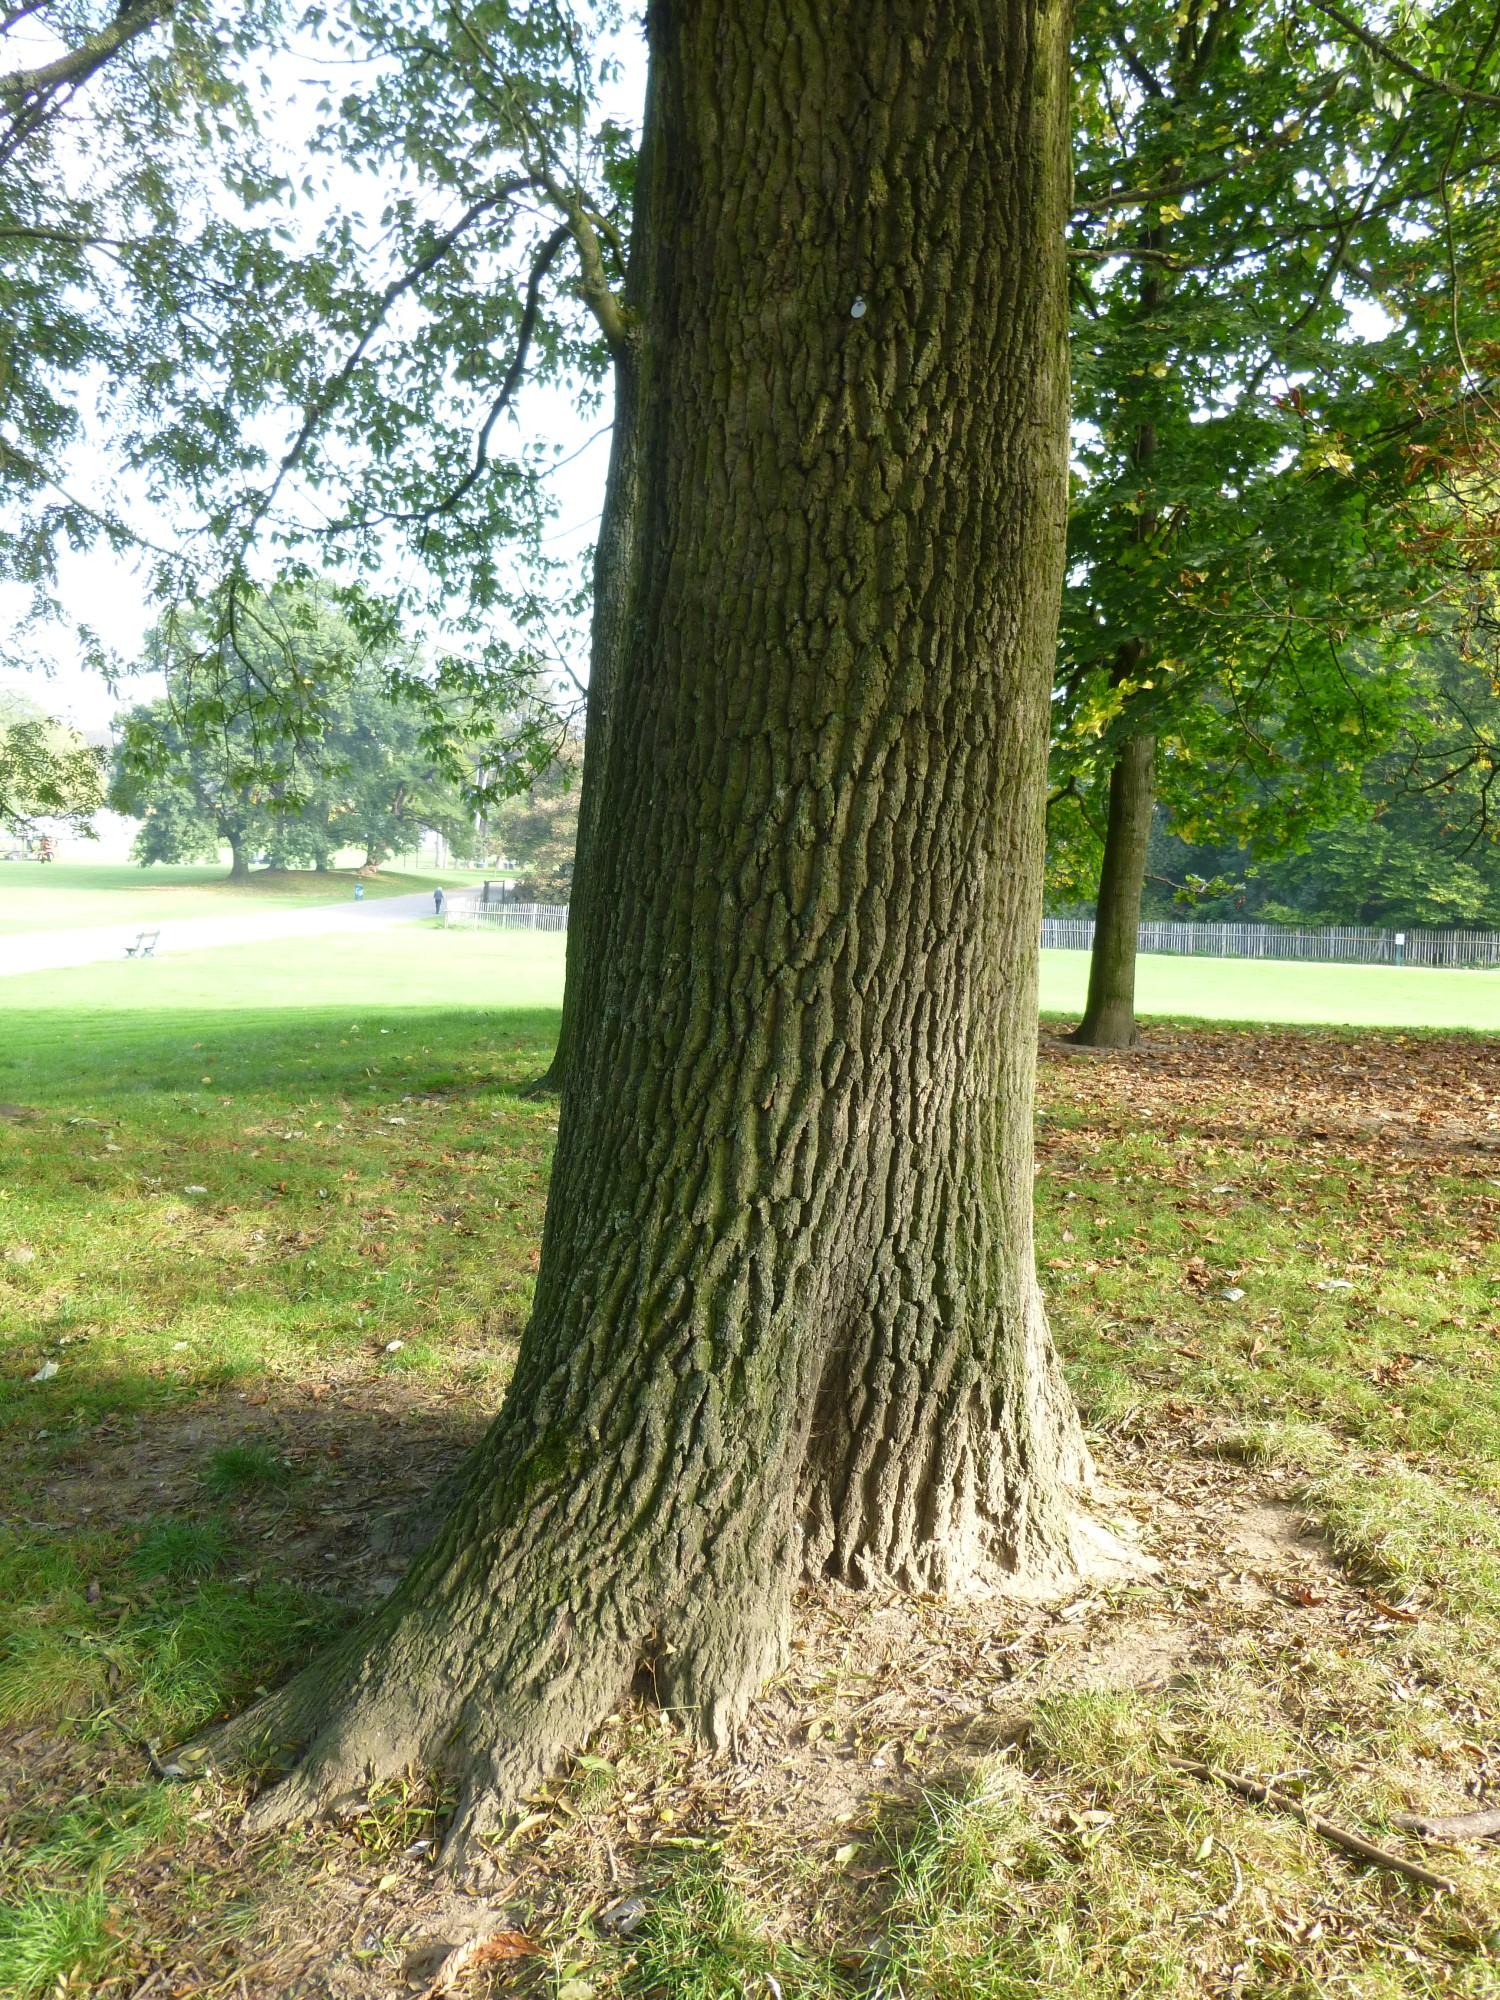 Fraxinus angustifolia 'Raywood', Parc public de Laeken